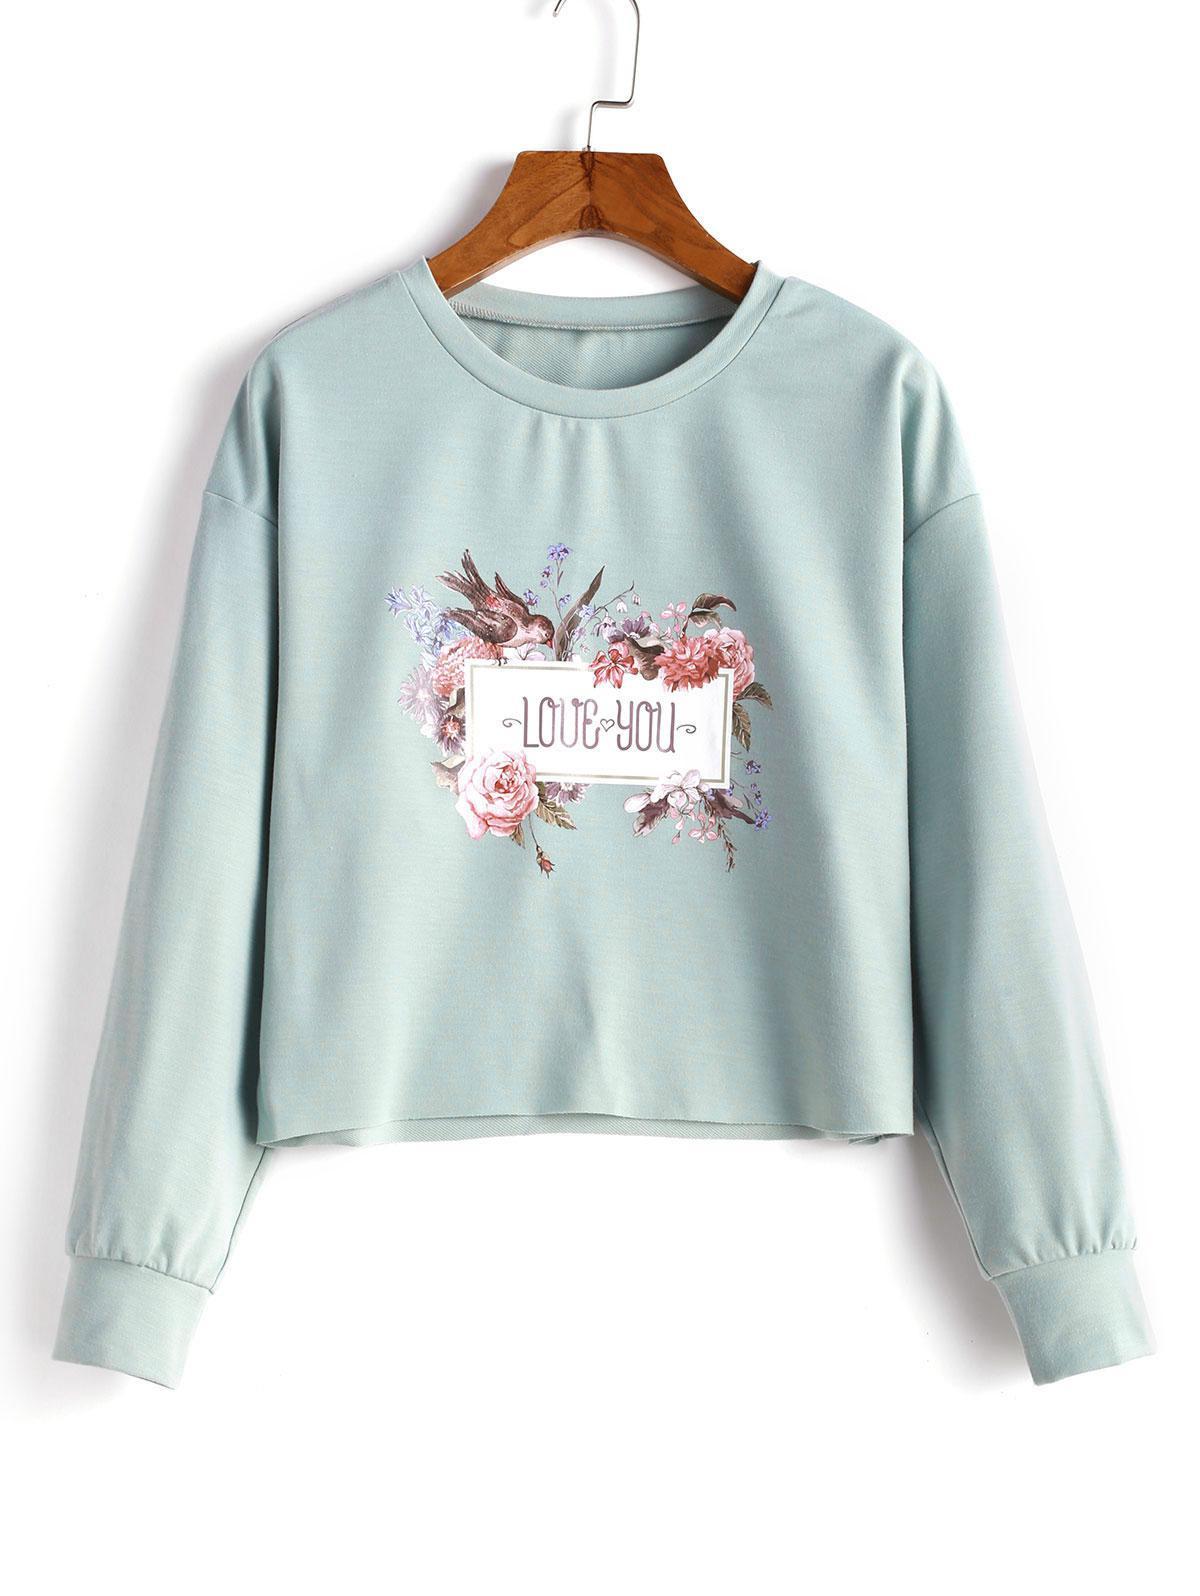 ZAFUL Raw Hem Floral Graphic Sweatshirt фото